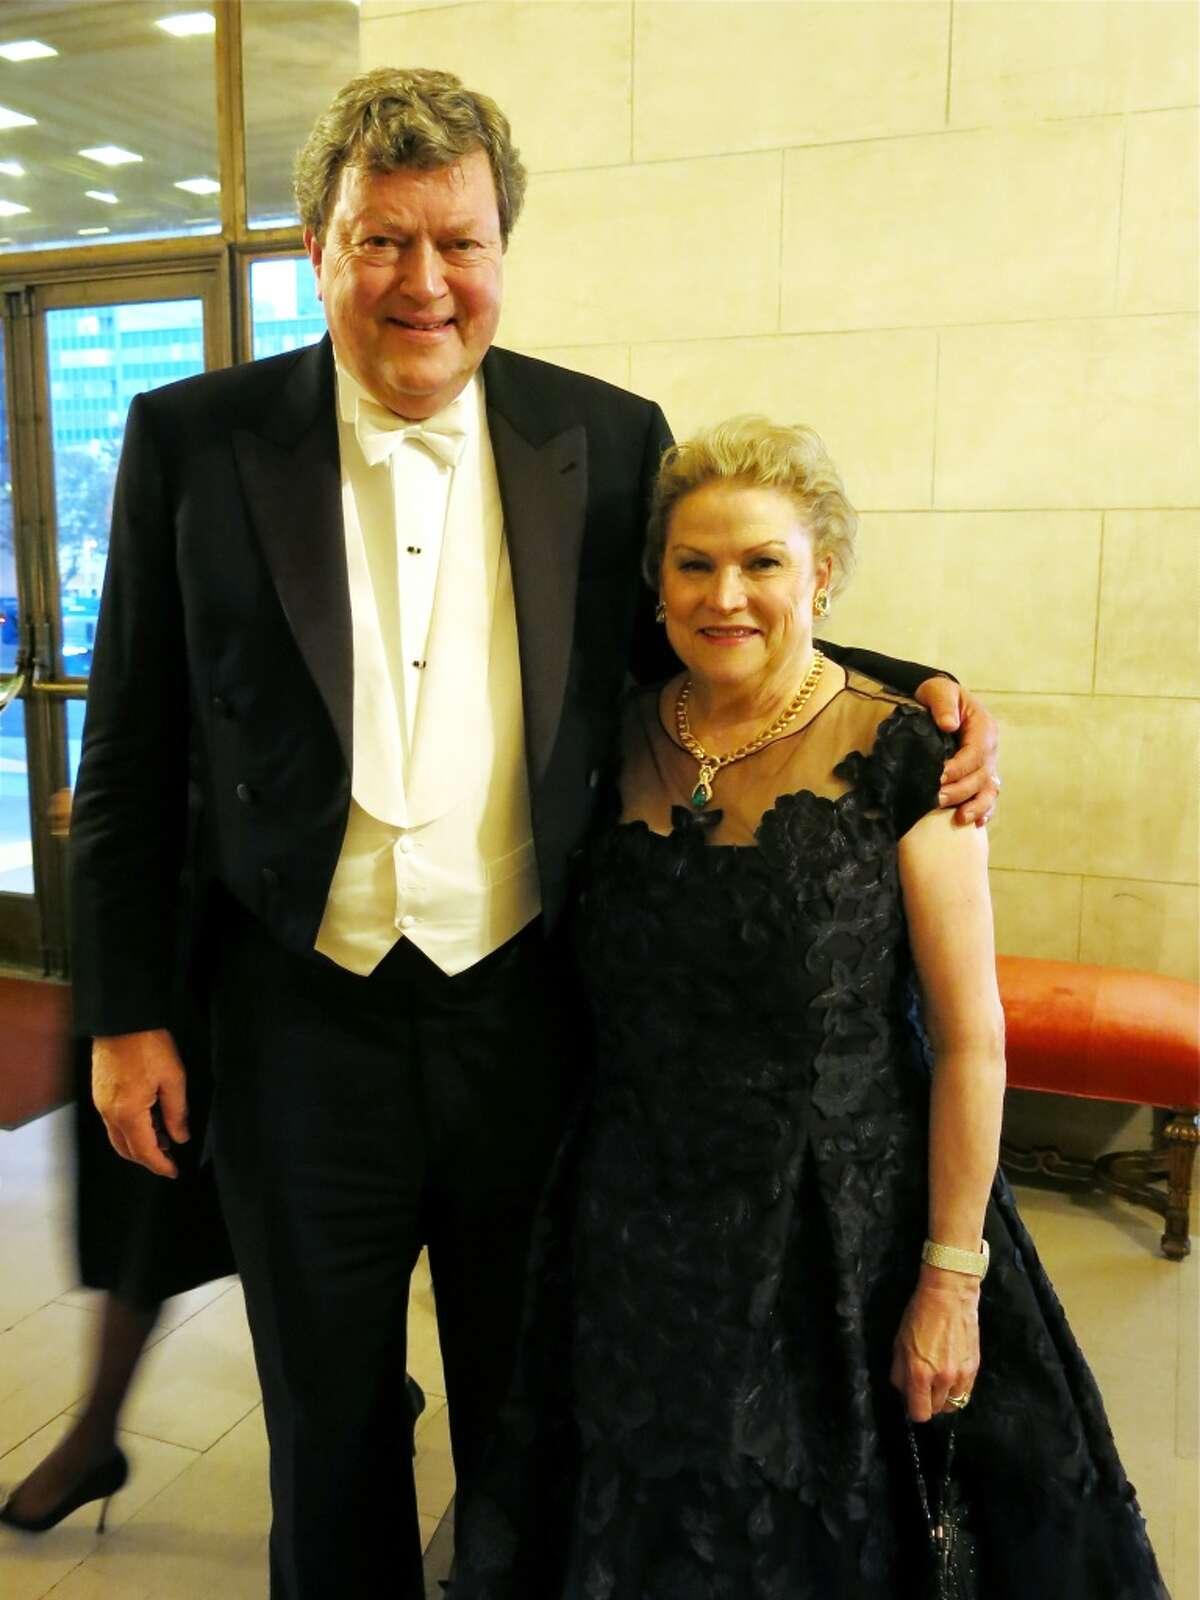 Opera Board chairman John Gunn and his wife, Honorary Opera Ball co-chair Cynthia Fry Gunn, are loyal Opera underwriters whose generosity will fund four productions this season alone.